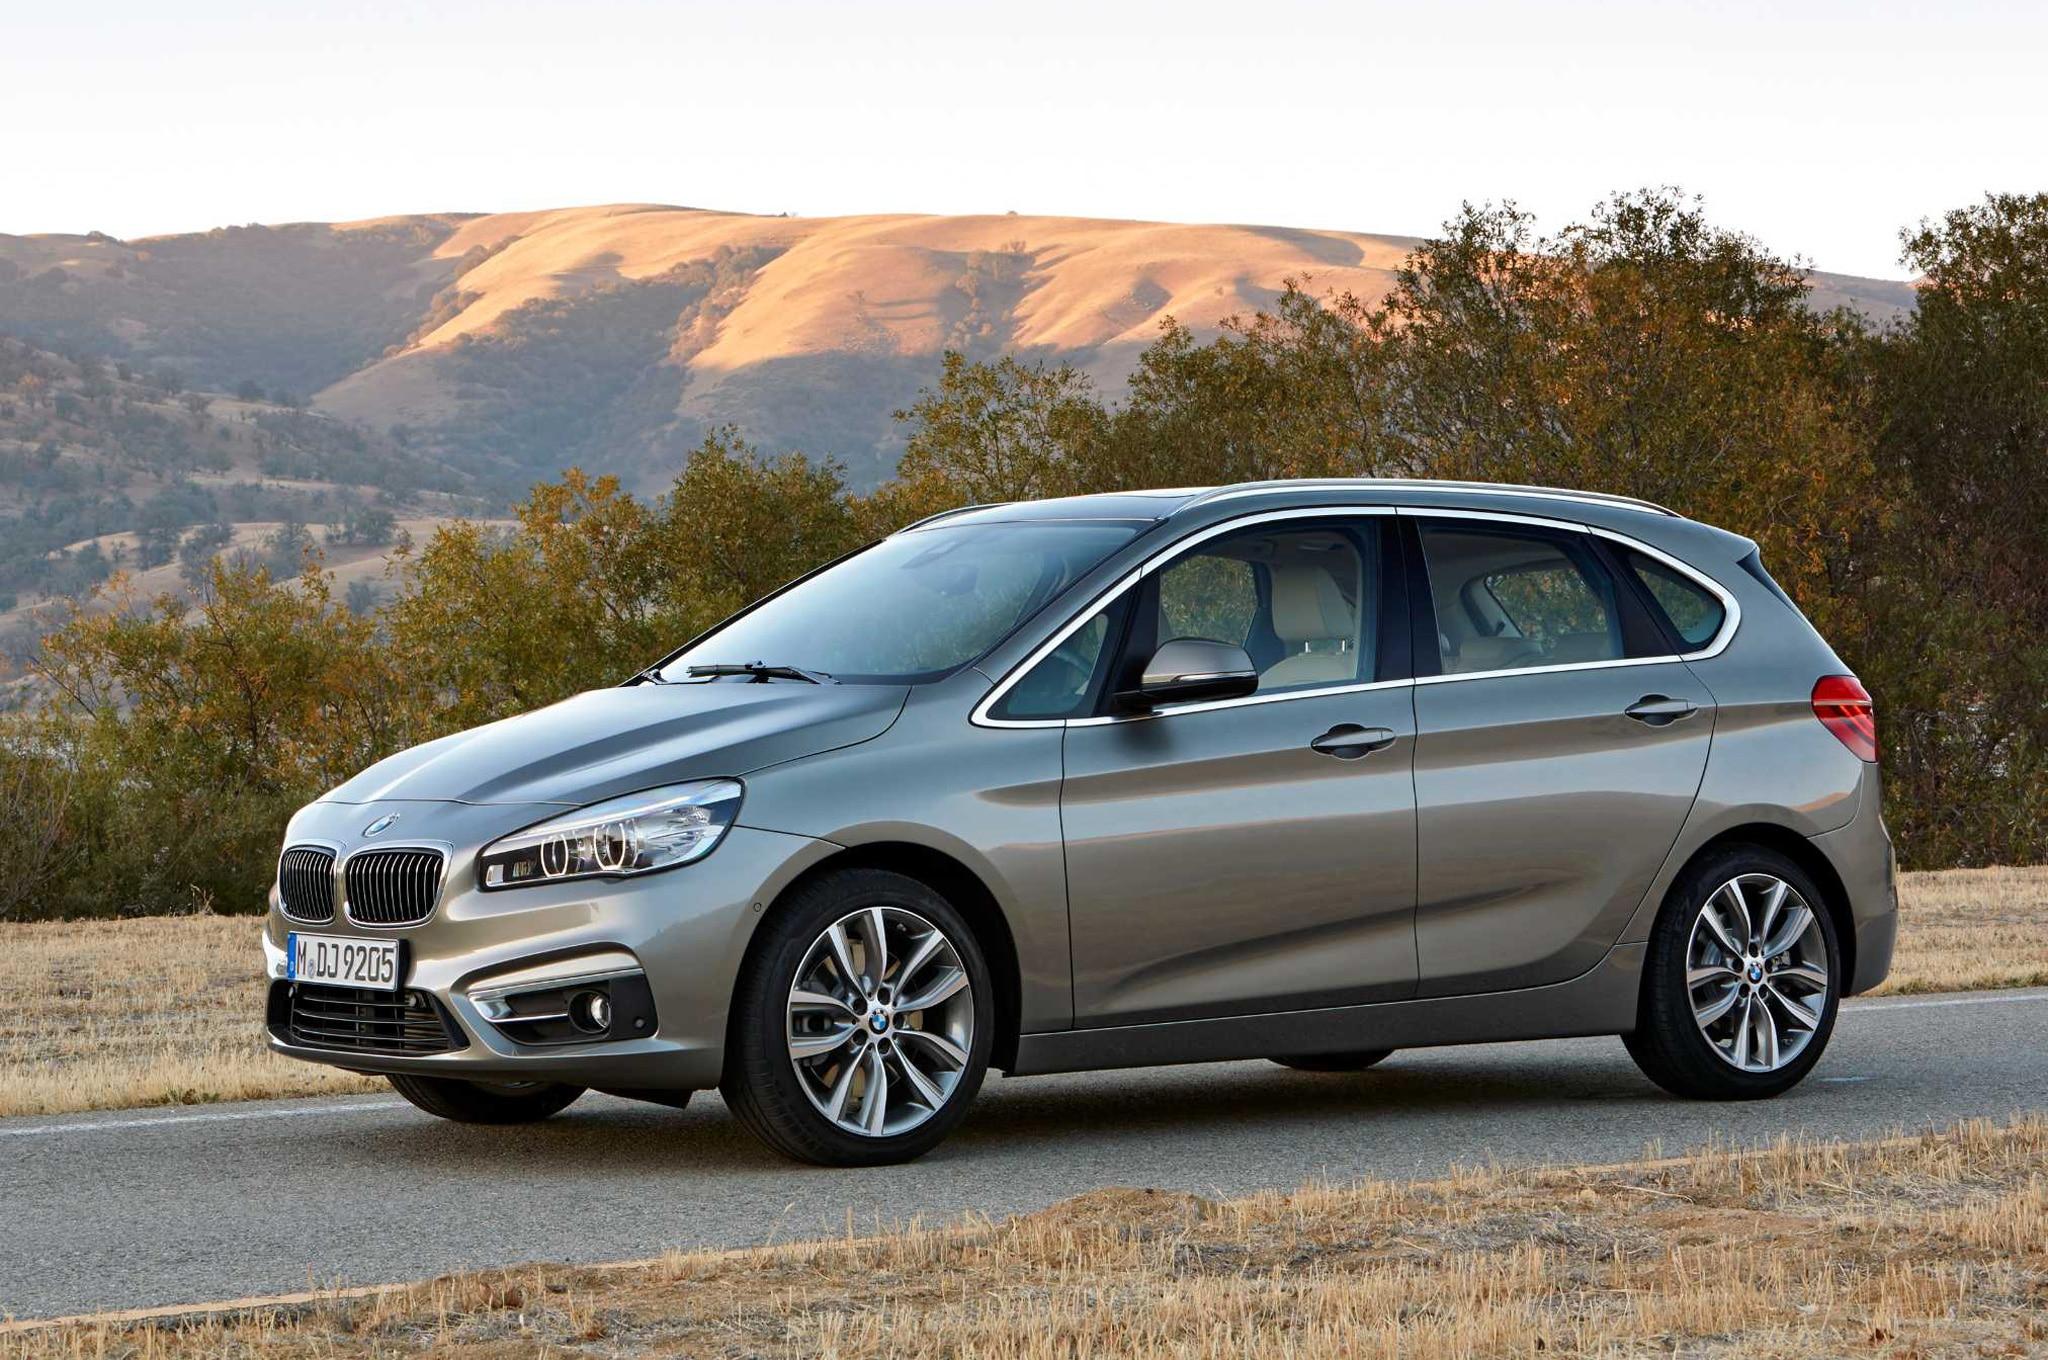 BMW 2 Series Active Tourer Detailed Ahead of 2014 Geneva Auto Show